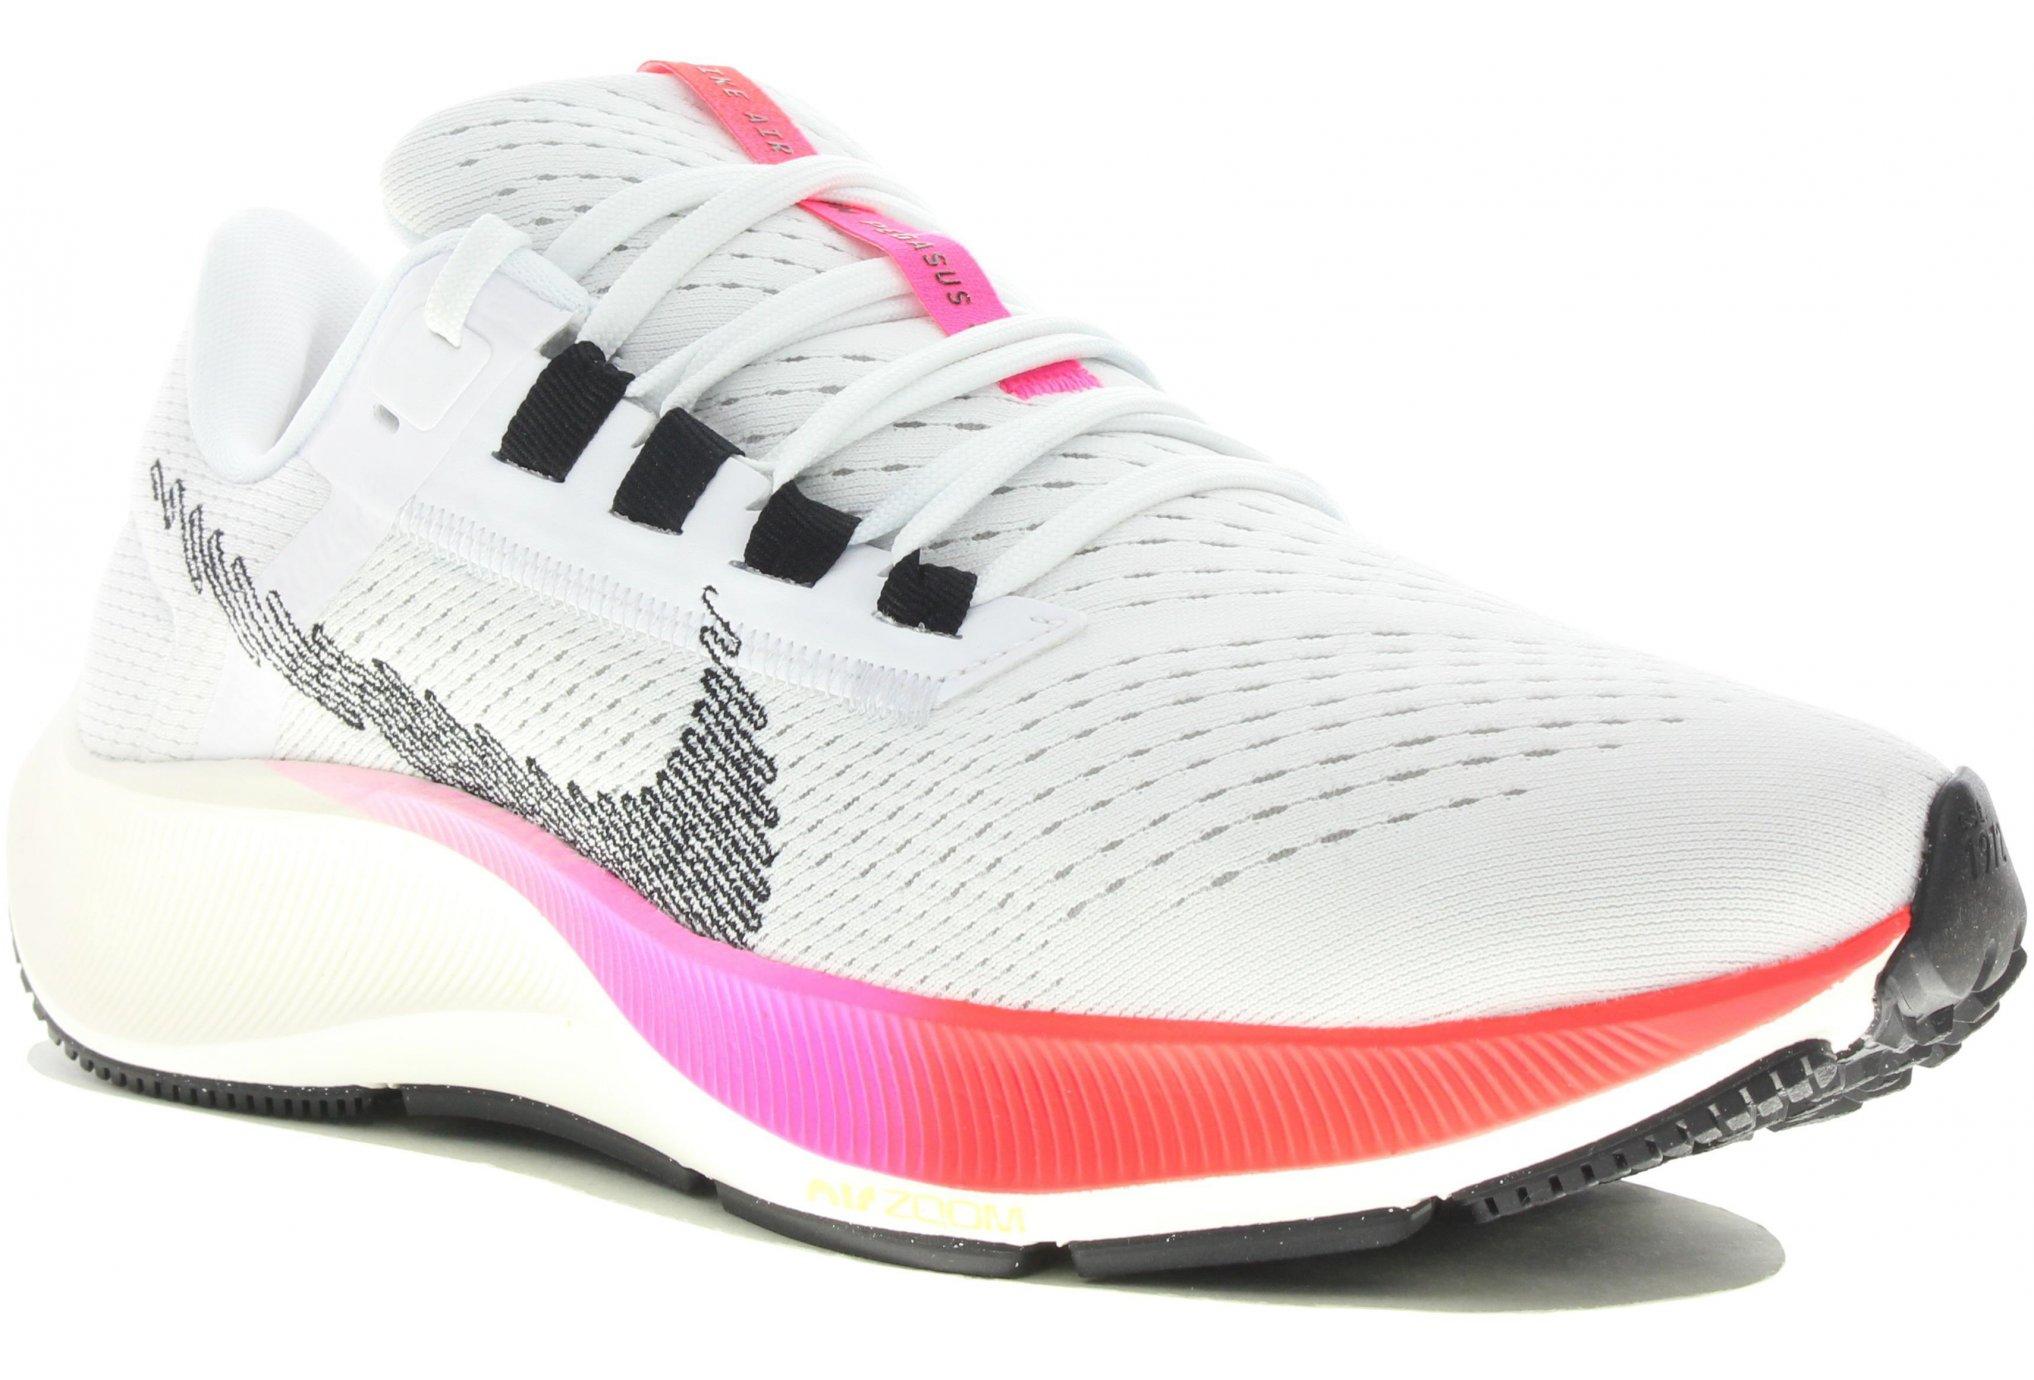 Nike Air Zoom Pegasus 38 Rawdacious W Chaussures running femme